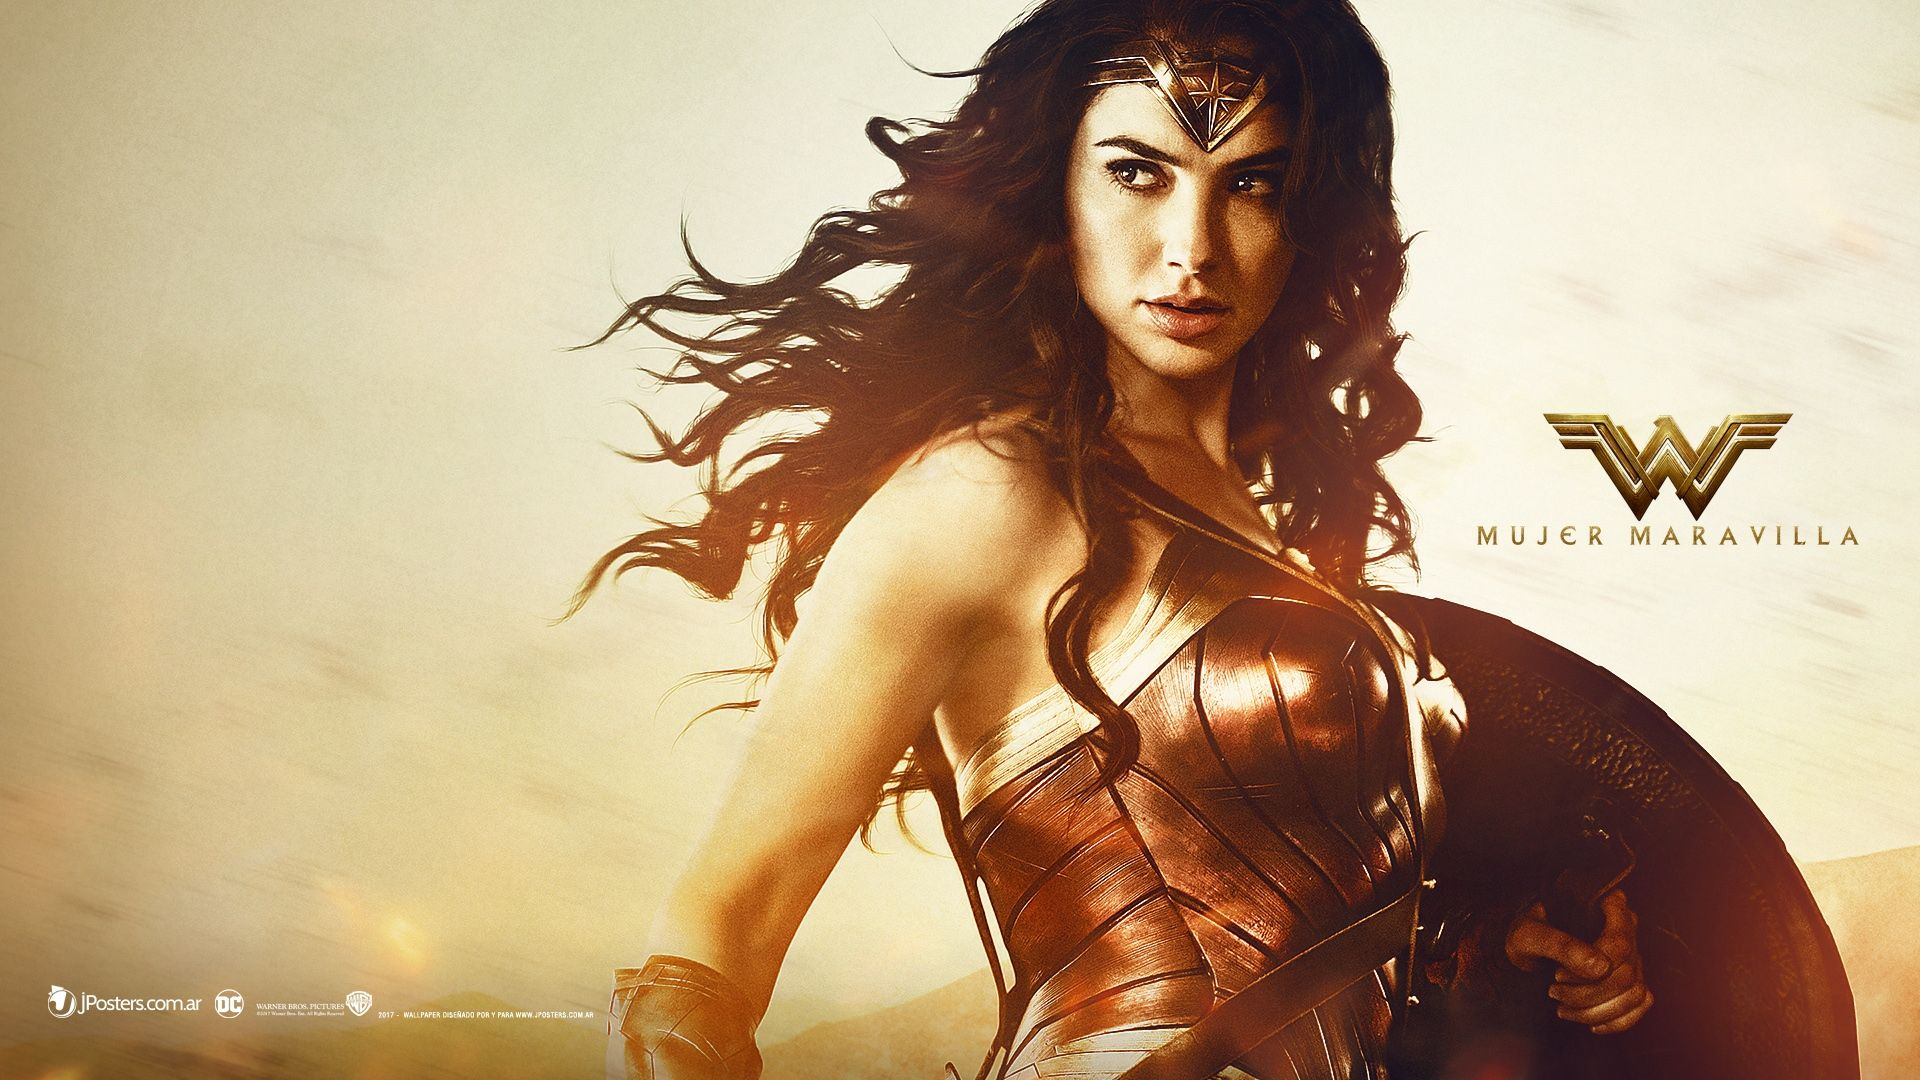 Wallpaper Gal Gadot Wonder Woman Hd Movies 7553: Wonder Woman 2017 Diana Prince (Gal Gadot) DC Movie